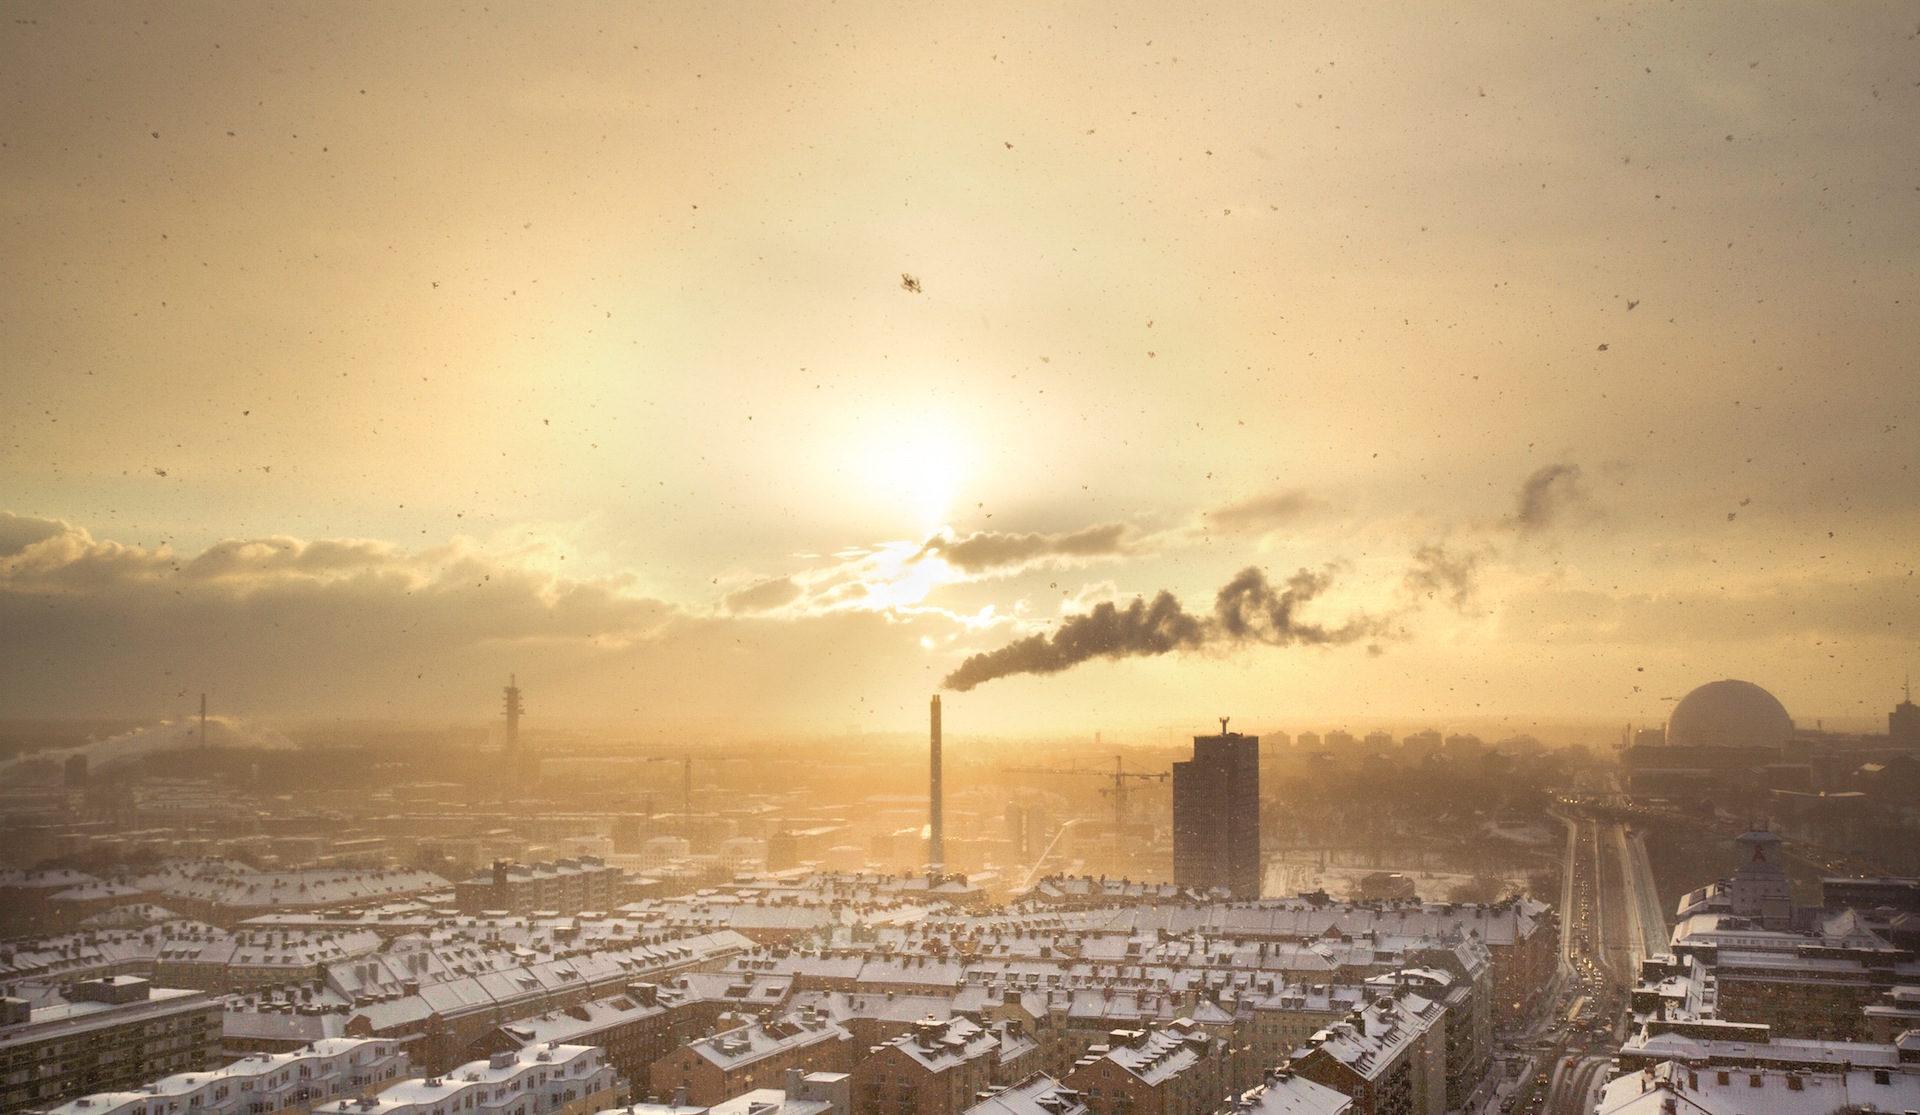 дым, облака, polución, contaminación, порошок - Обои HD - Профессор falken.com